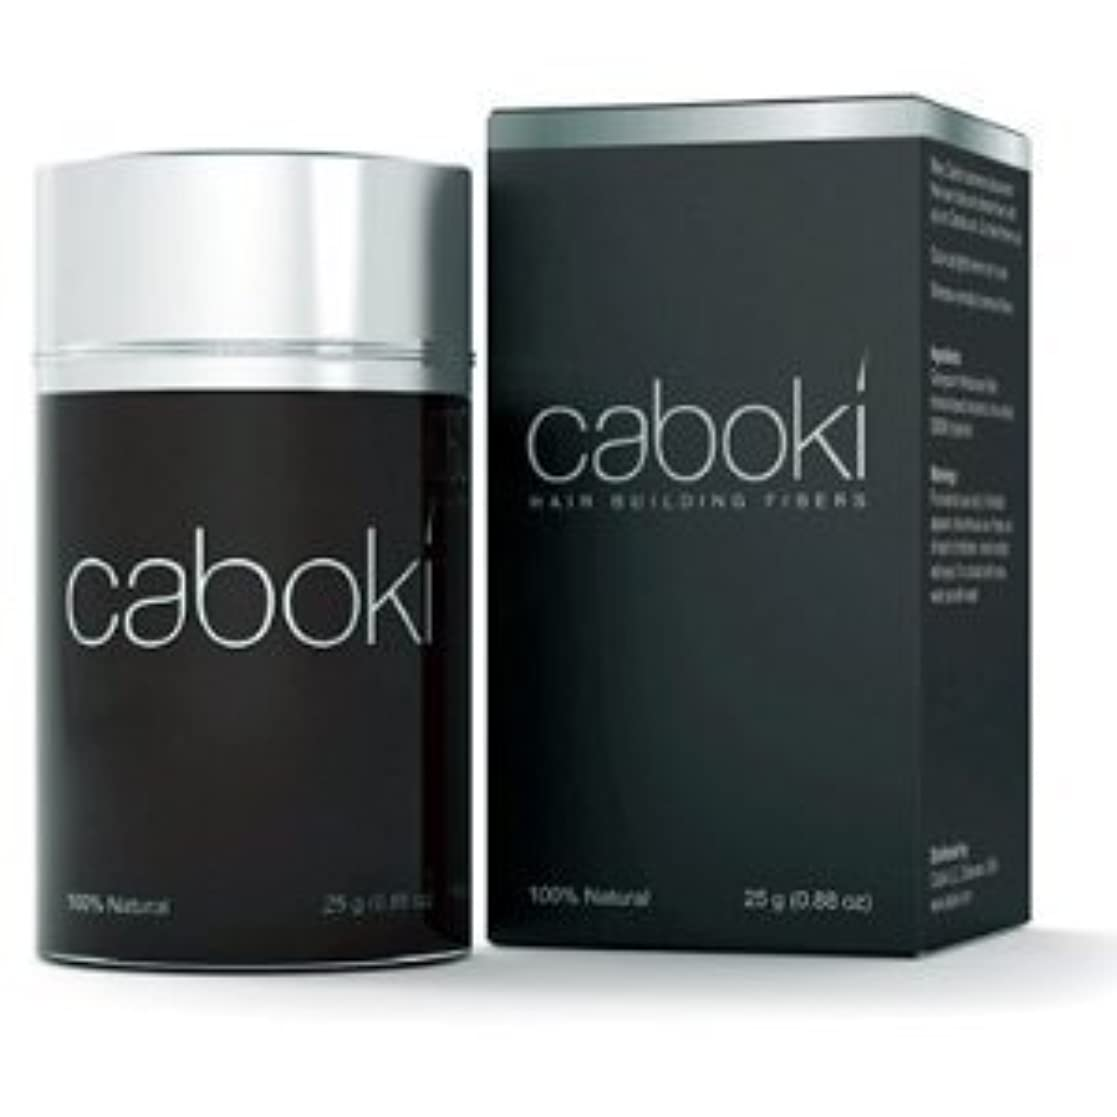 Caboki カボキコンシーラー 約50日分 25g  (ミディアムブラウン MediumBrown) [並行輸入品]